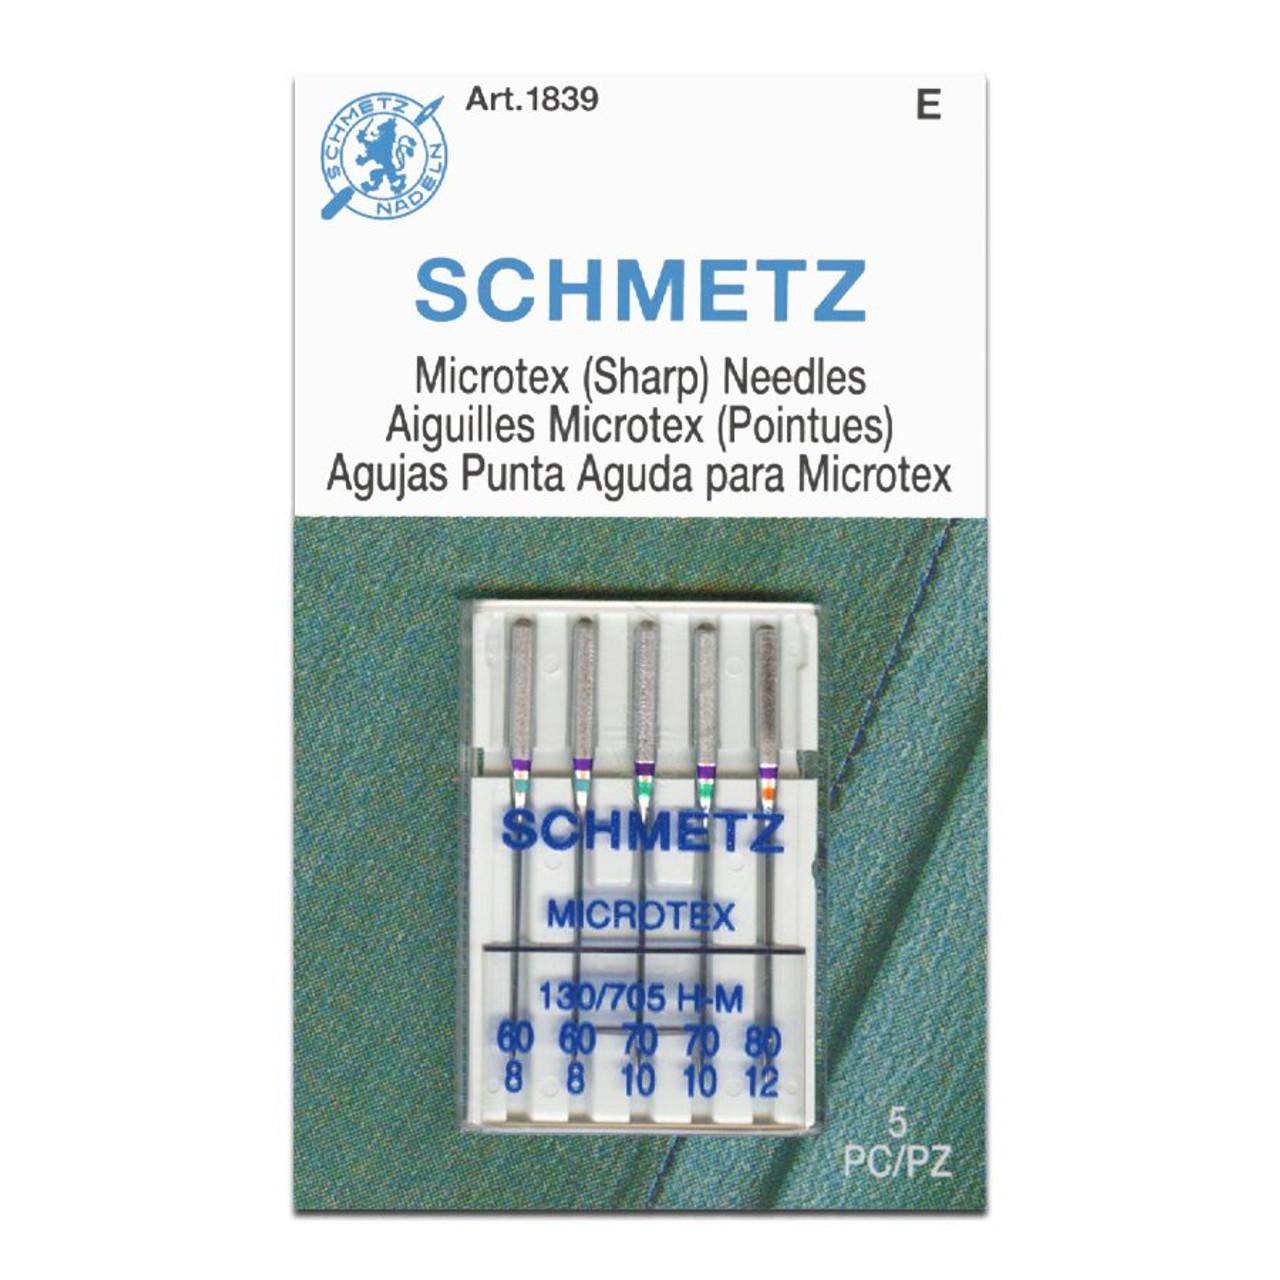 Schmetz Microtex Needles